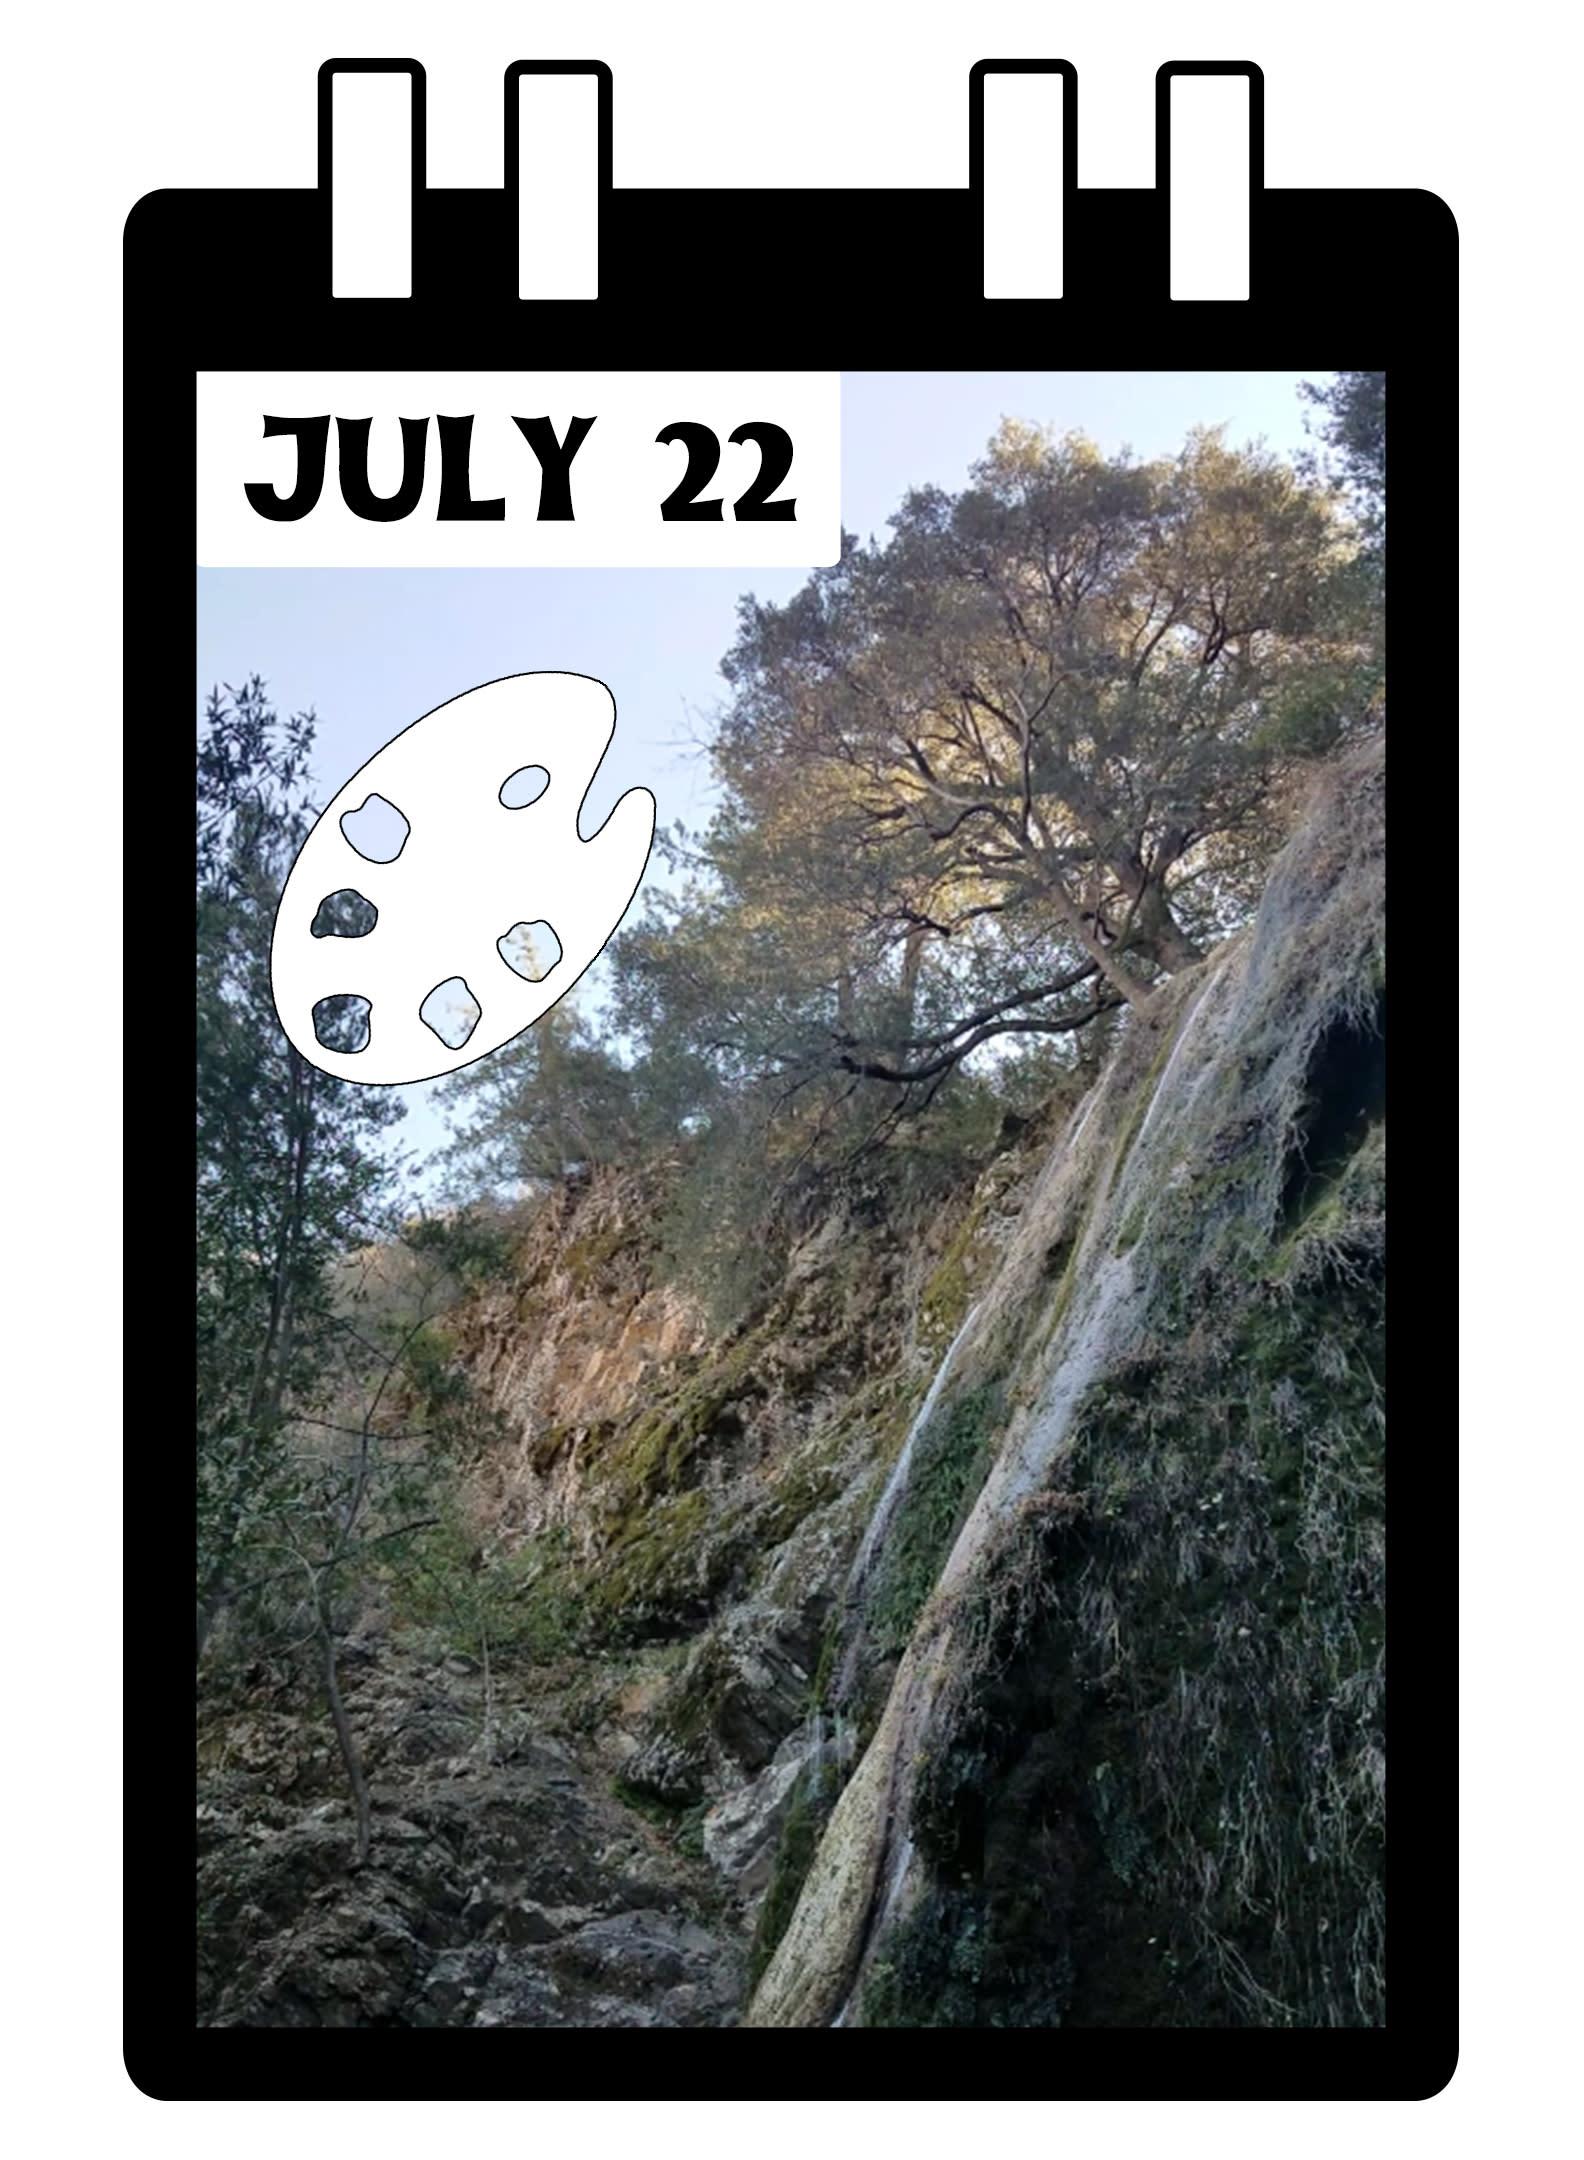 7 july 22 painting o86iv4